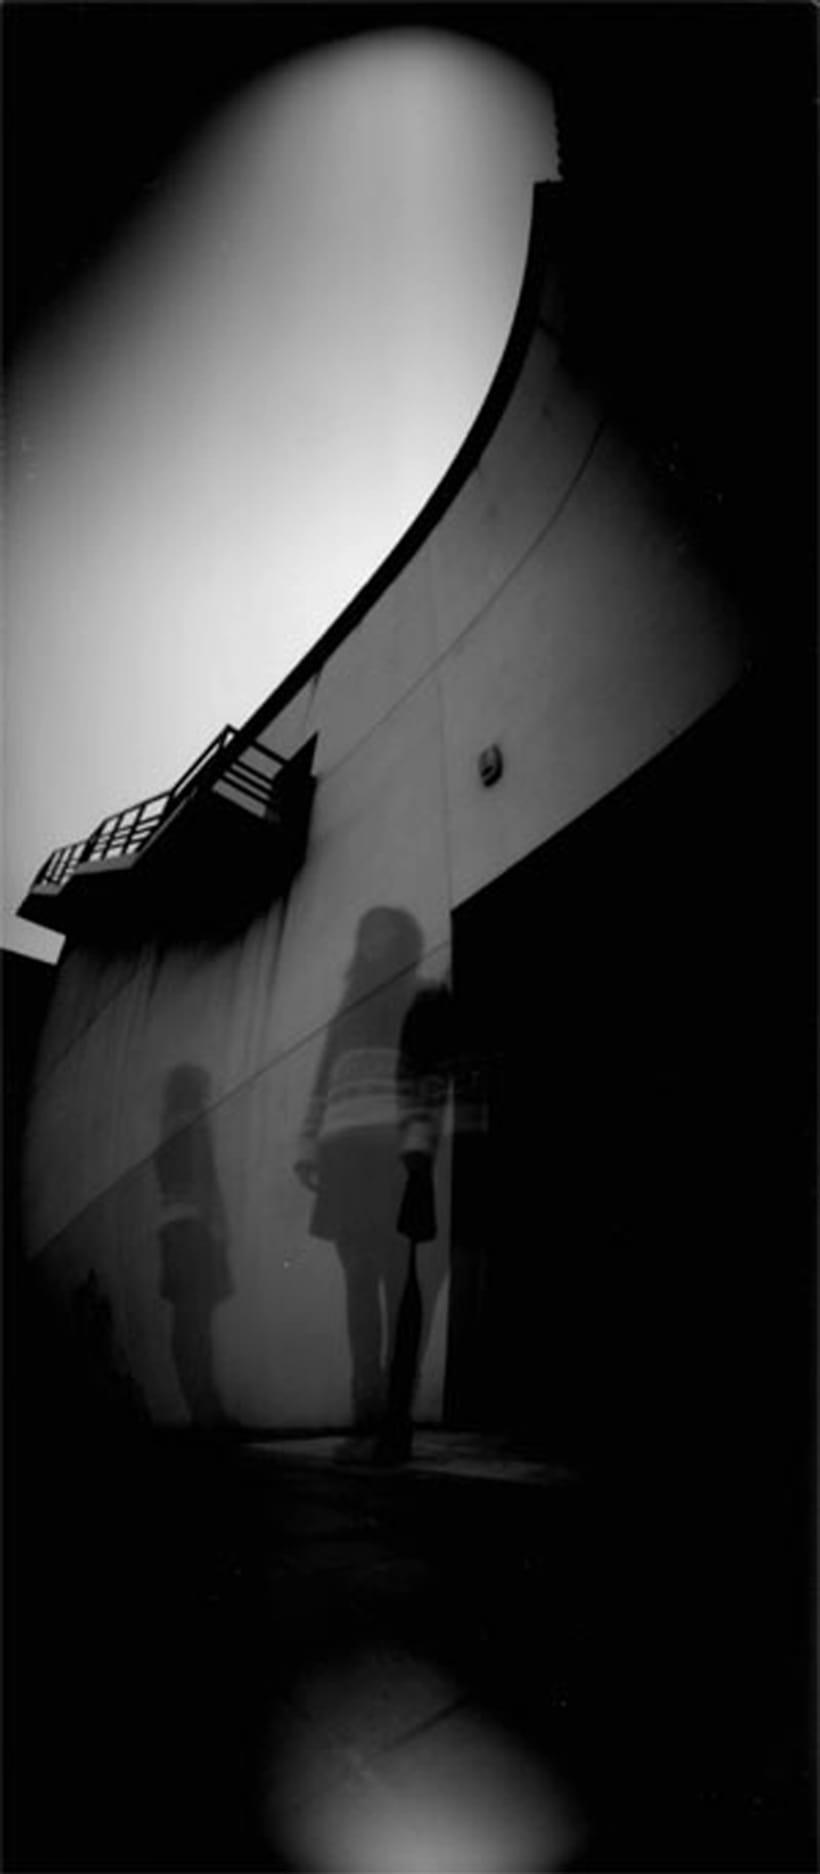 Camara Oscura 9